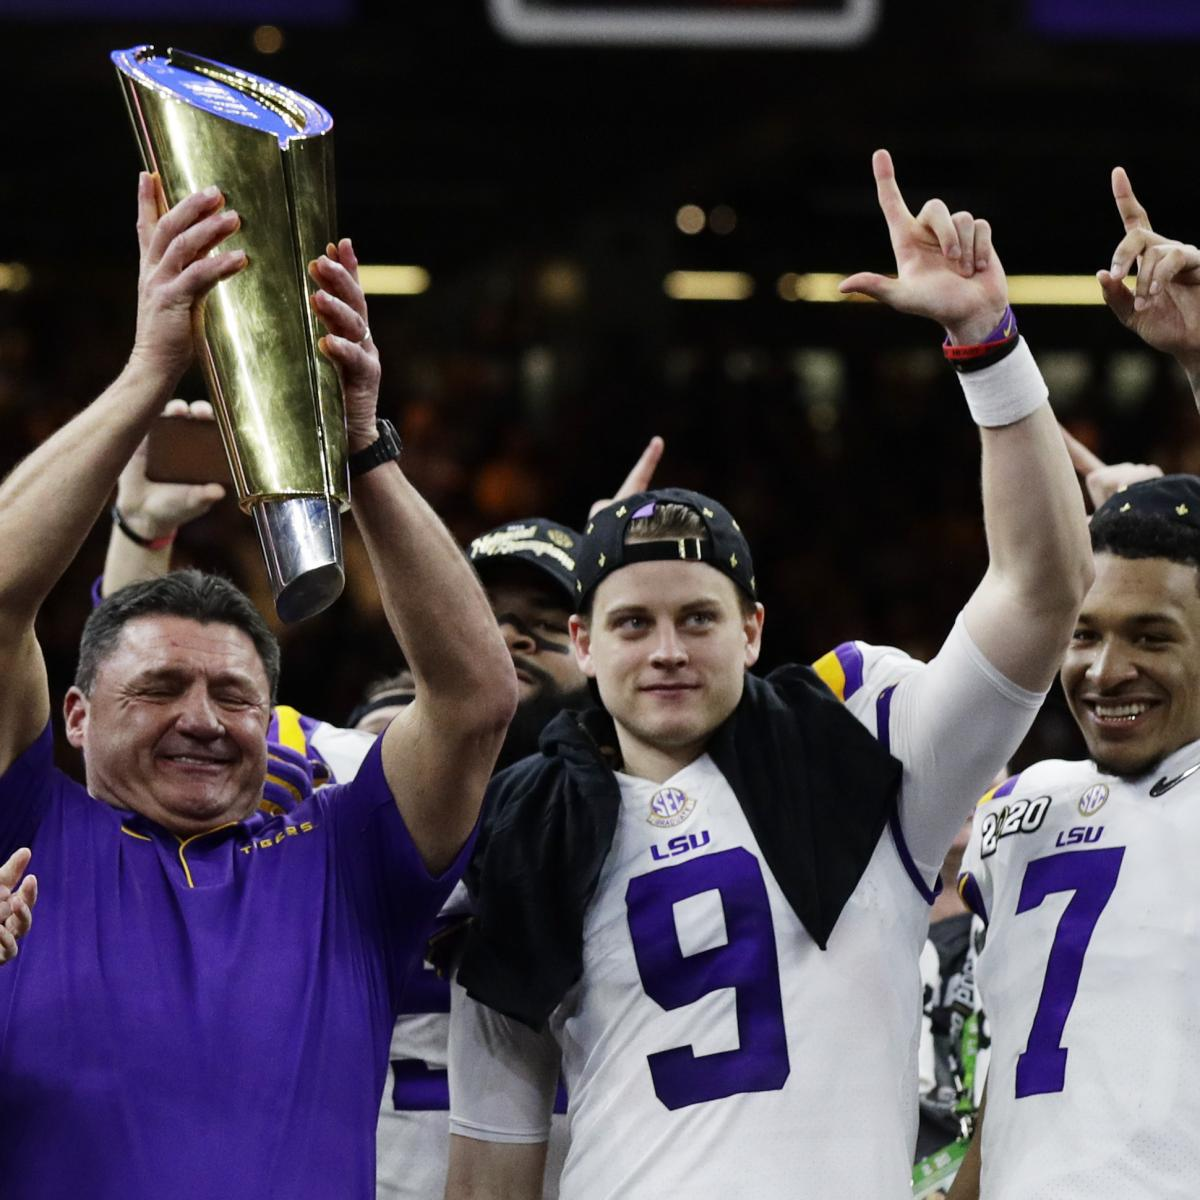 Joe Burrow Reflects on Heisman Trophy, Championship Season After Win vs. Clemson